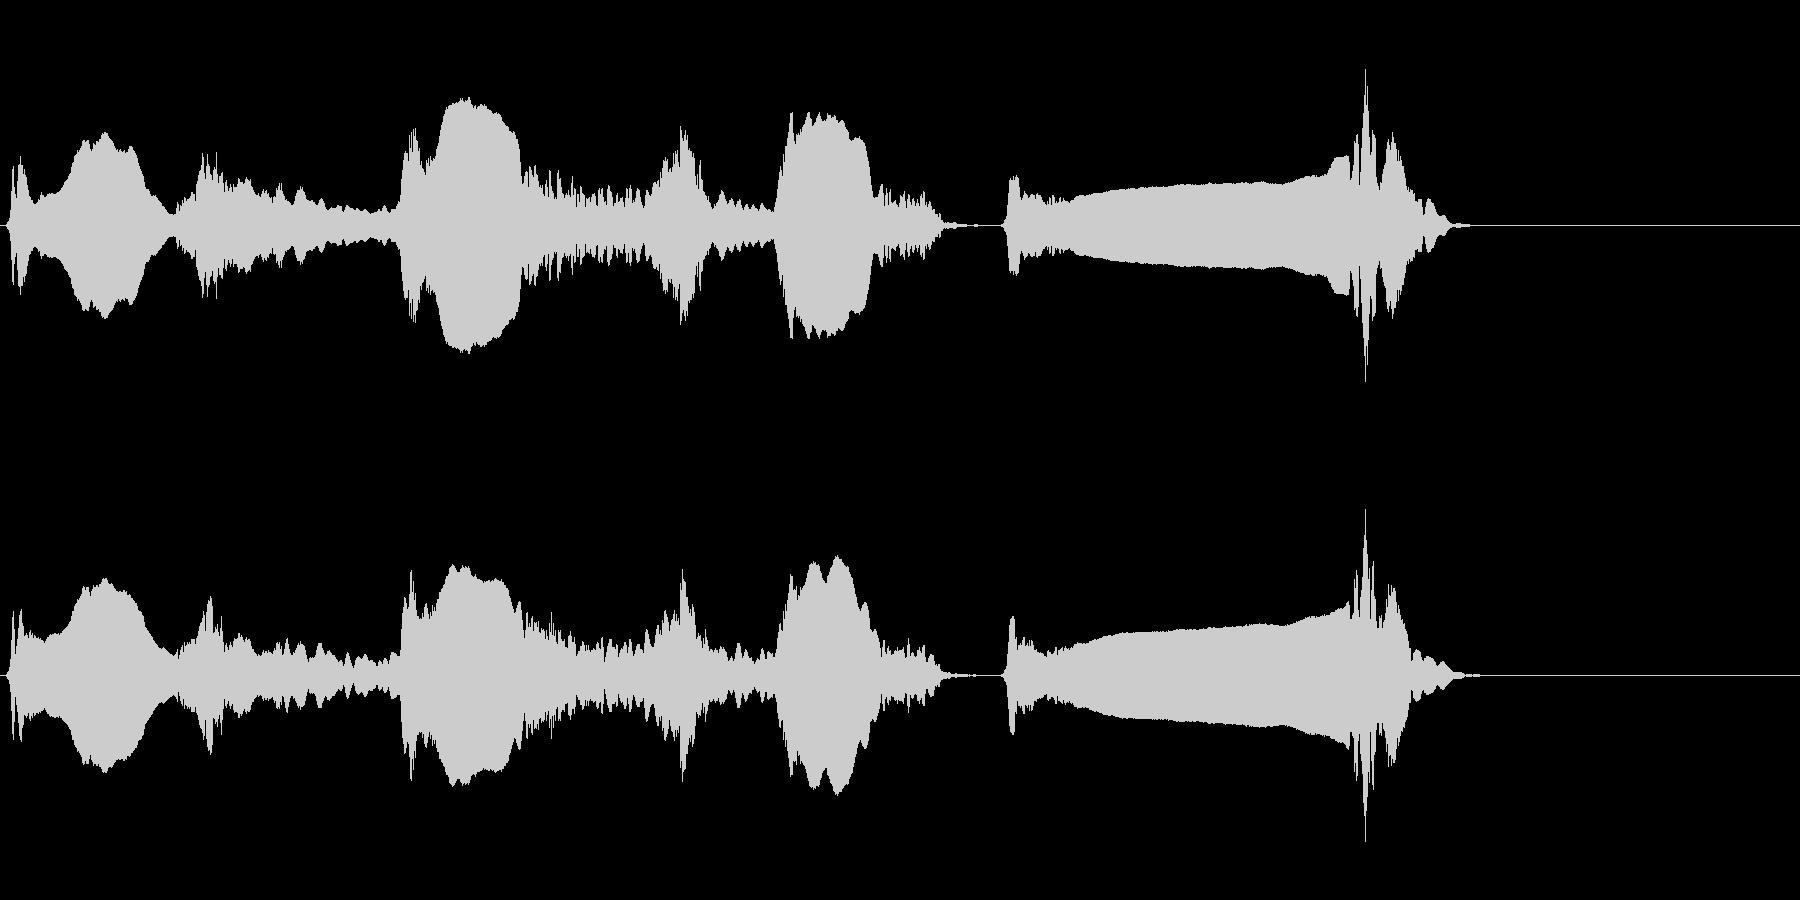 尺八 生演奏 古典風#5の未再生の波形